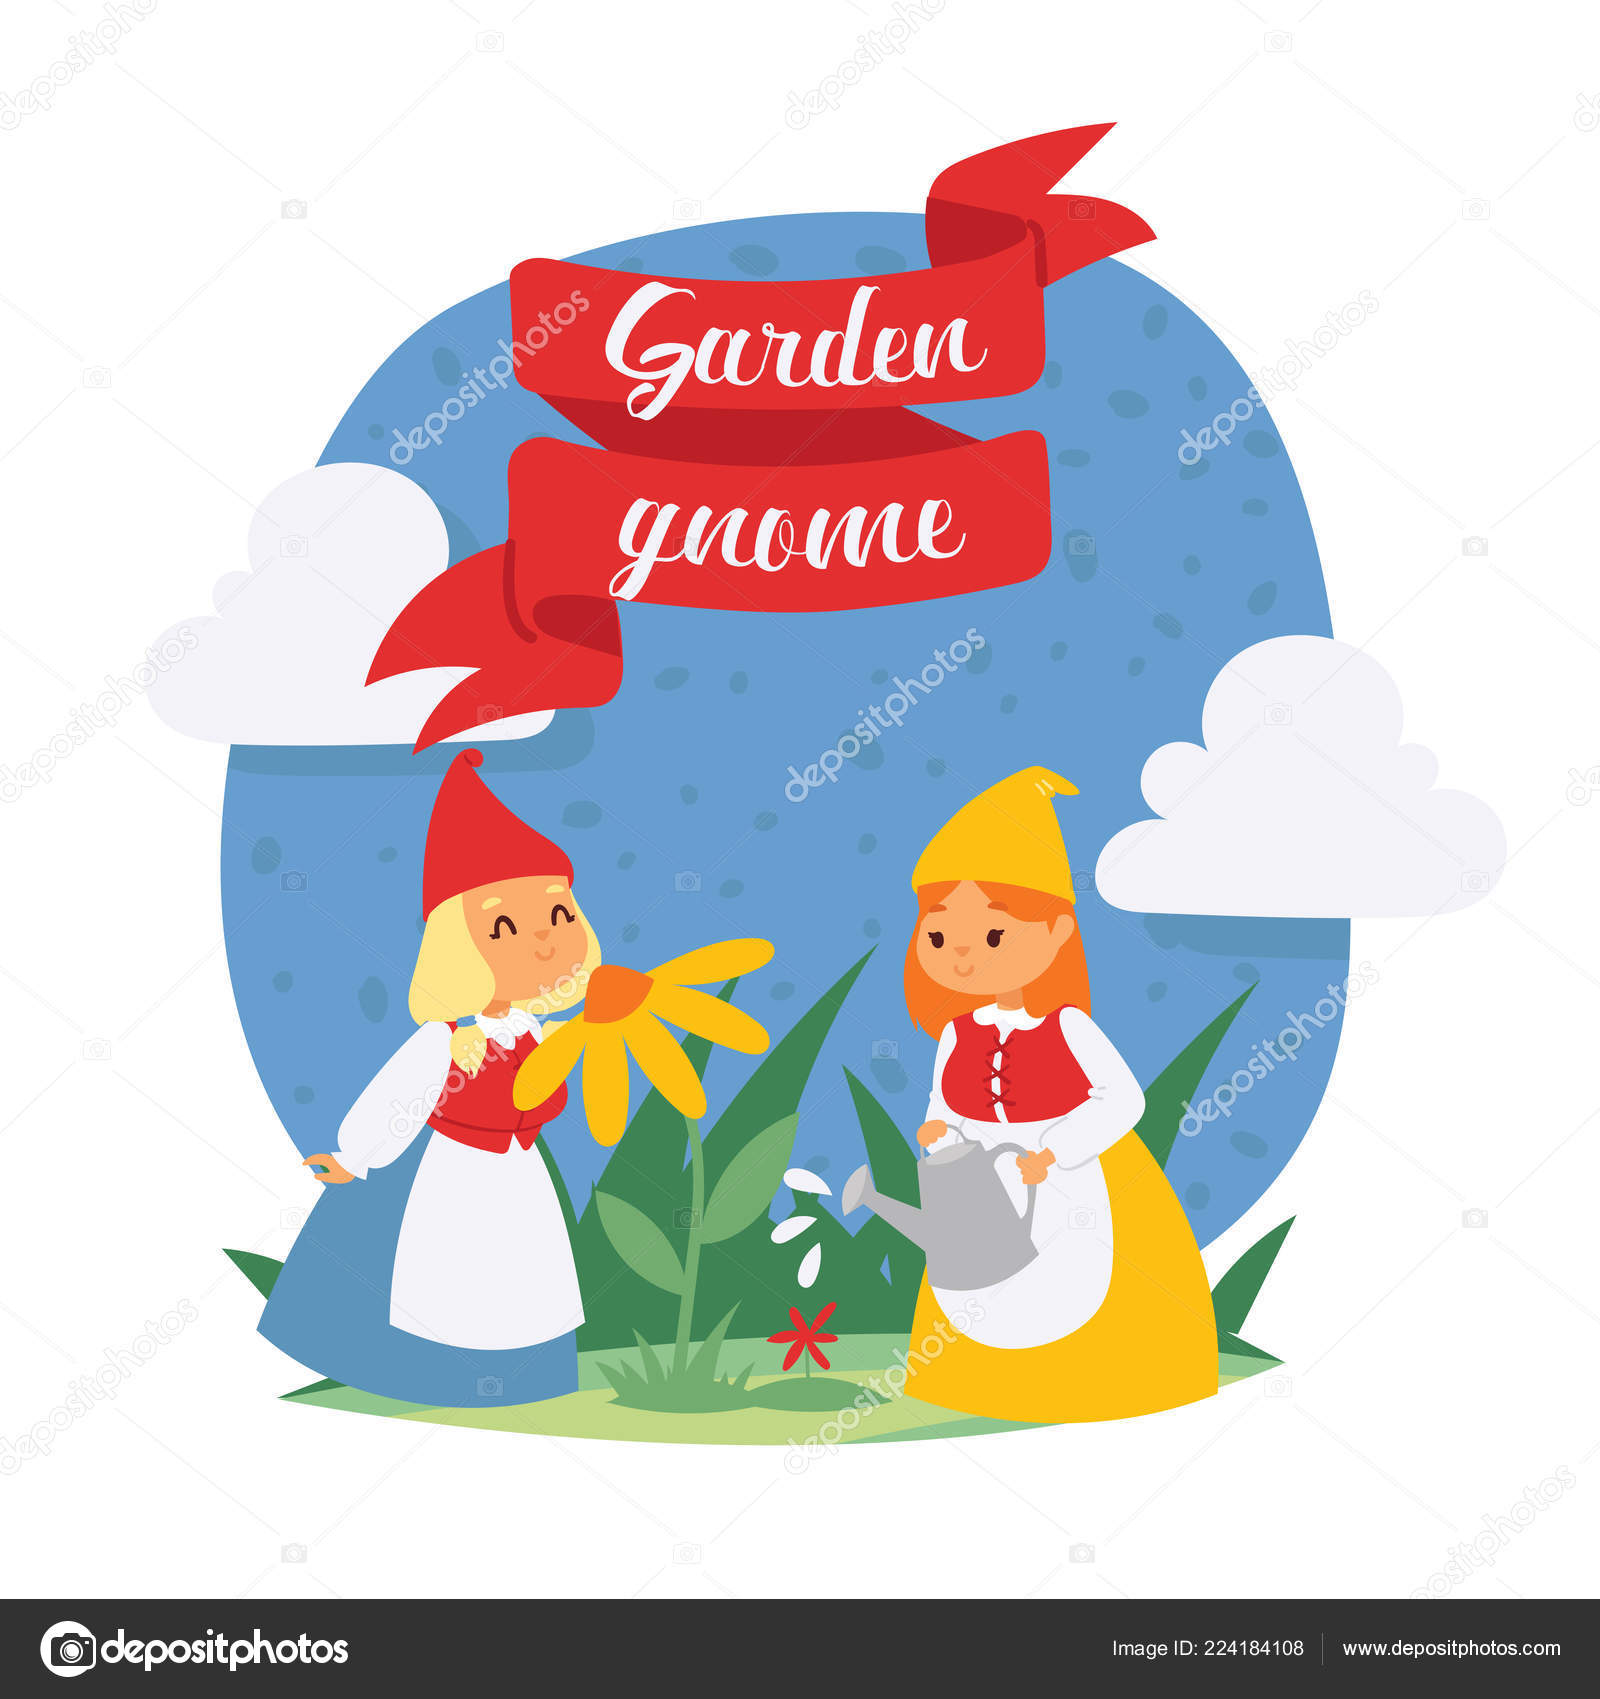 e5e6e9cb0129e Garden Gnome Girls Dwarf Characters Cadr And Gardening Flayer